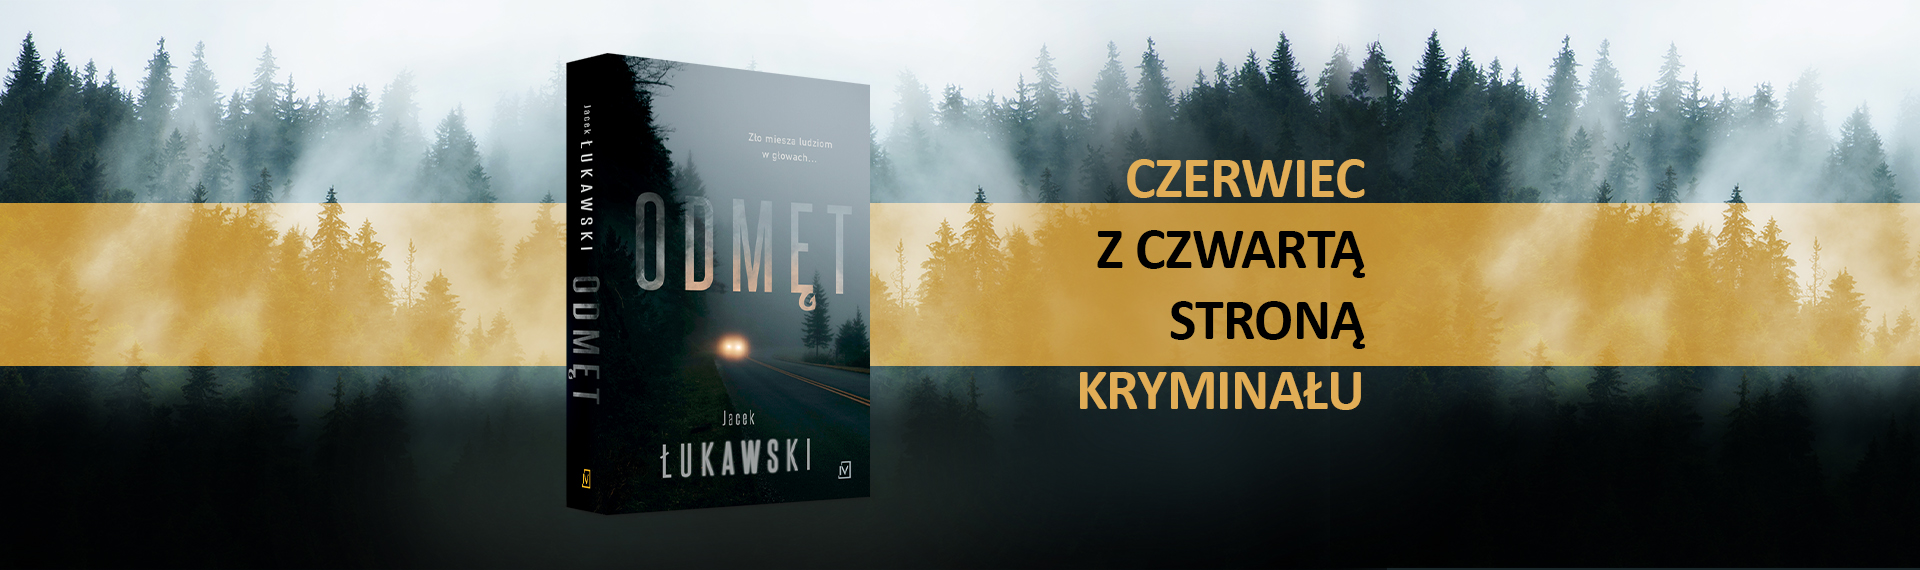 Odmęt Jacek Łukawski